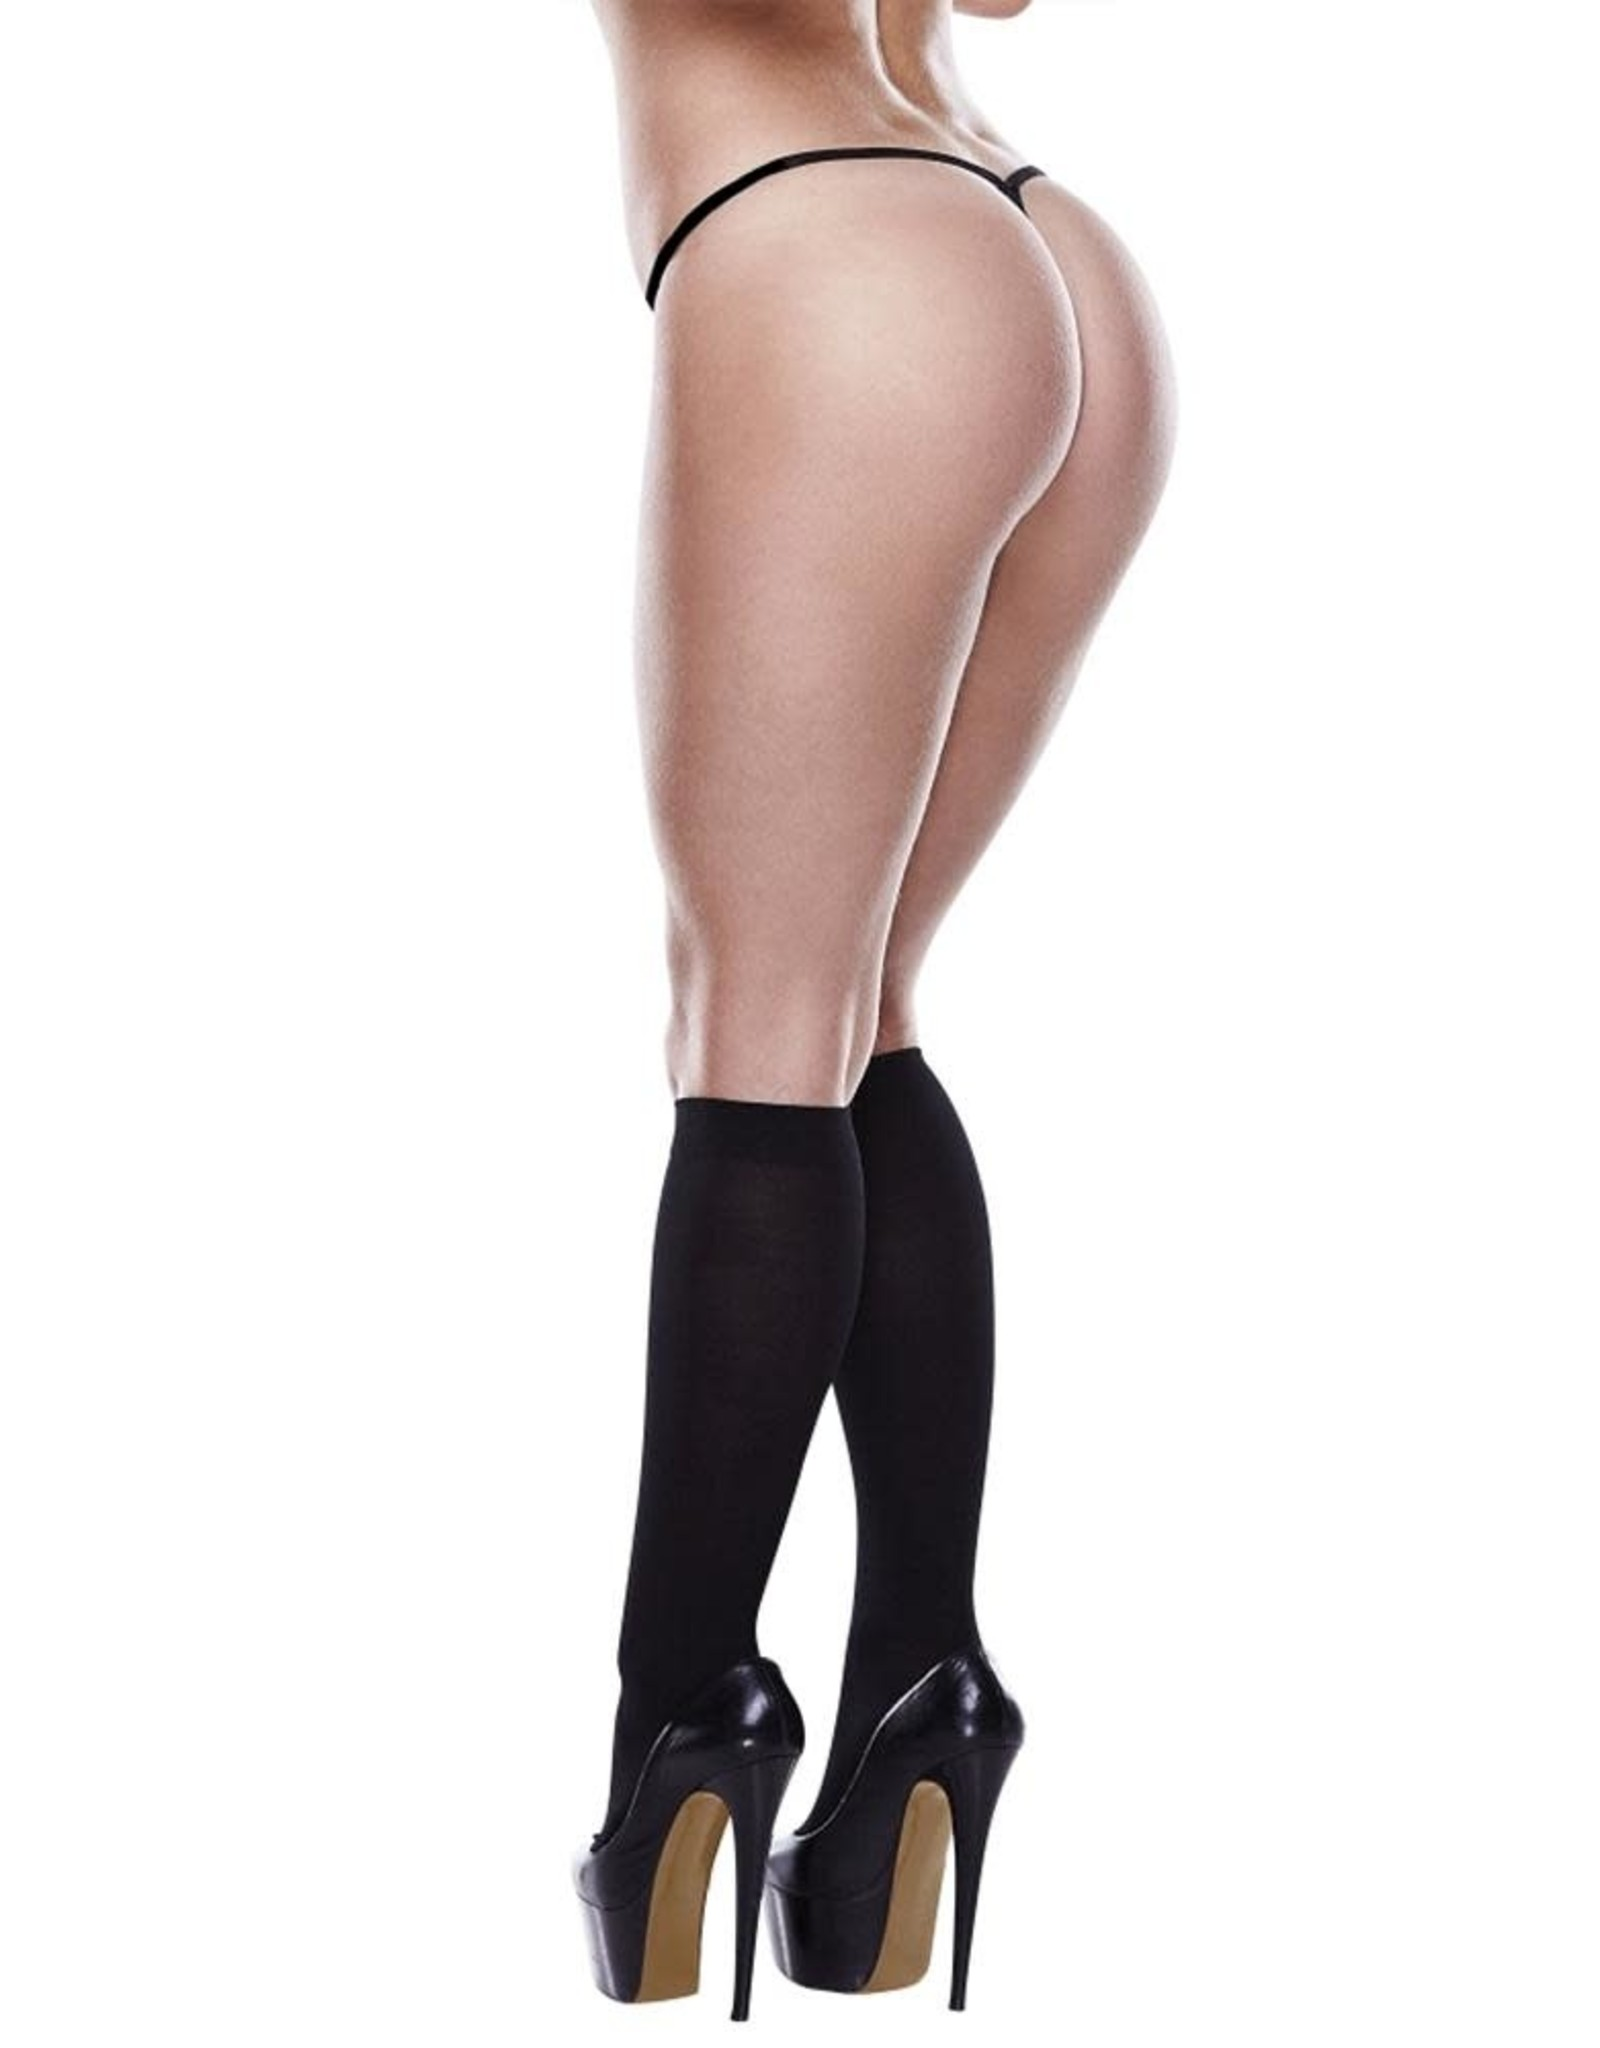 Baci Sheer Knee High - Black - OS